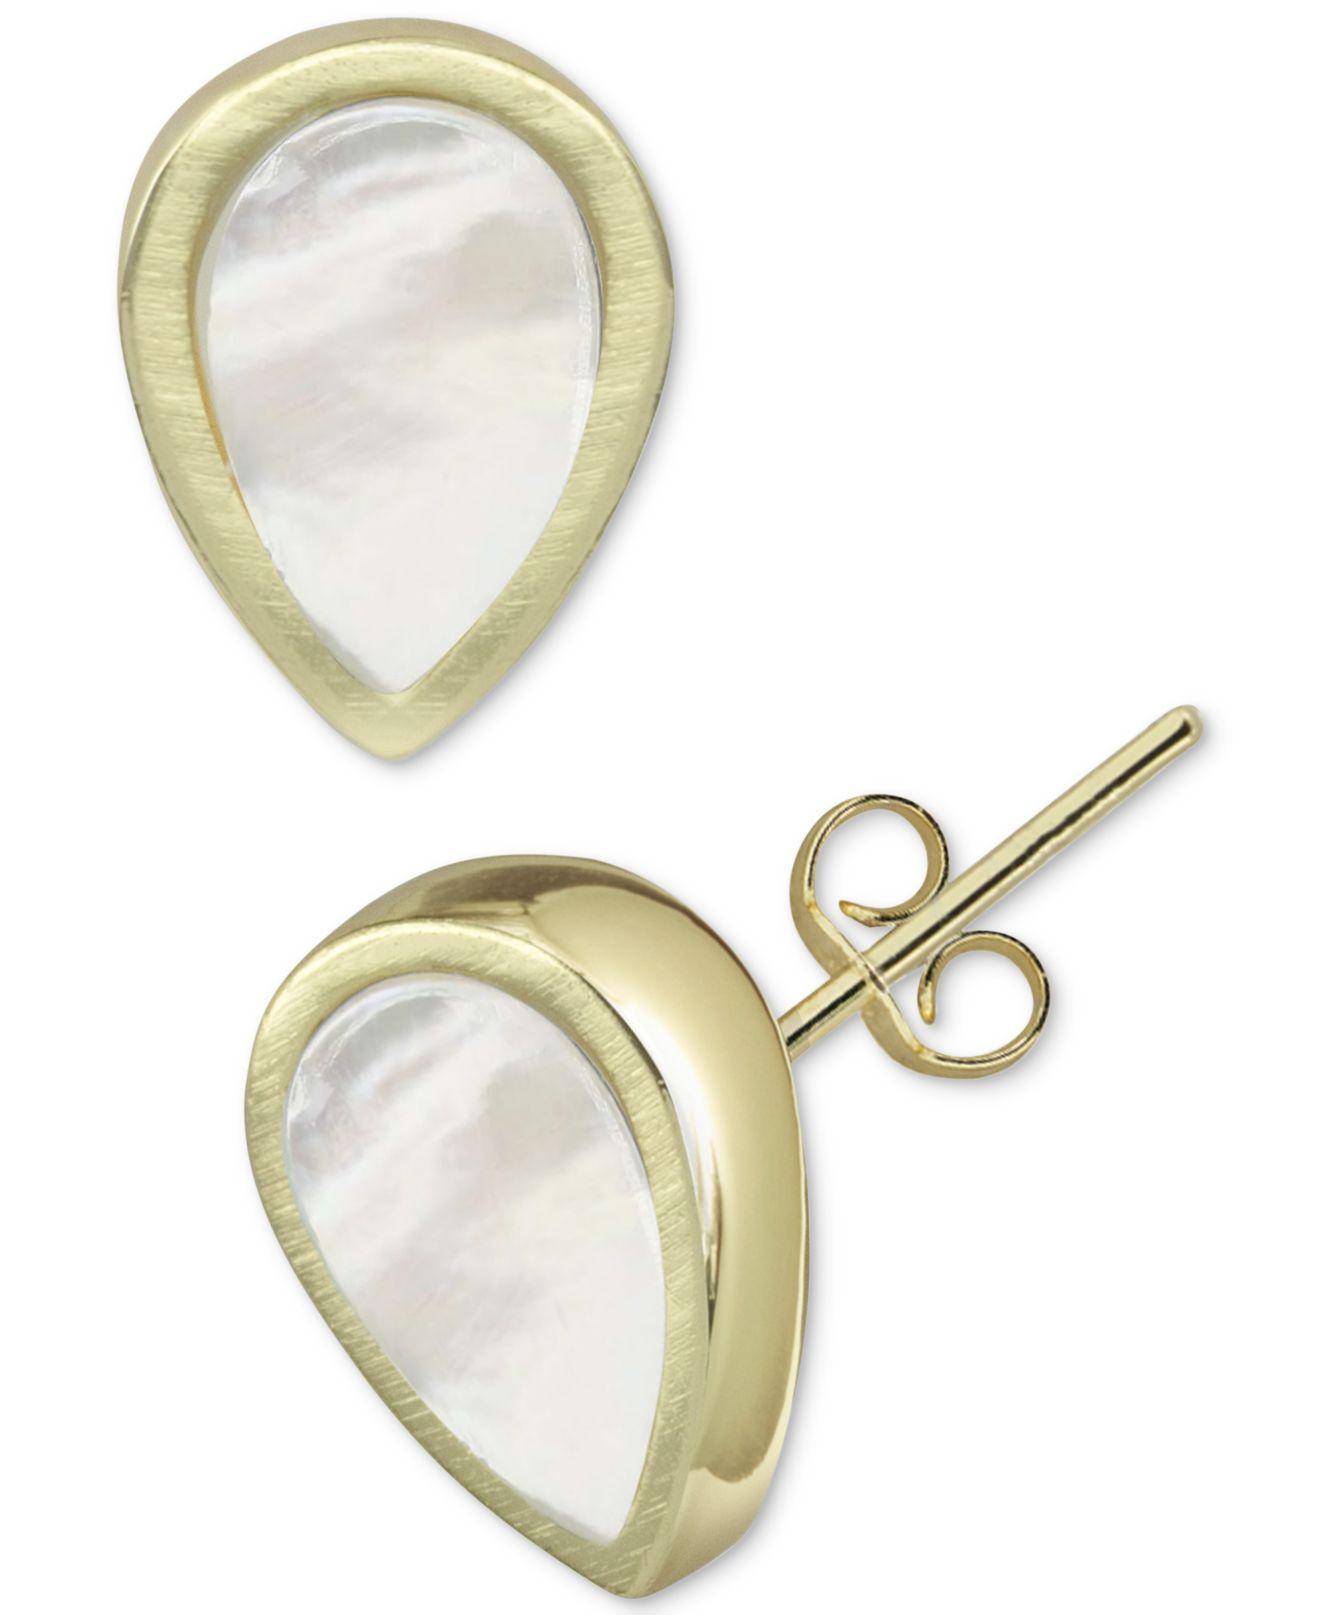 384cc6d47 Argento Vivo. Women's Metallic Mother-of-pearl Teardrop Stud Earrings In  Gold-plated Sterling Silver